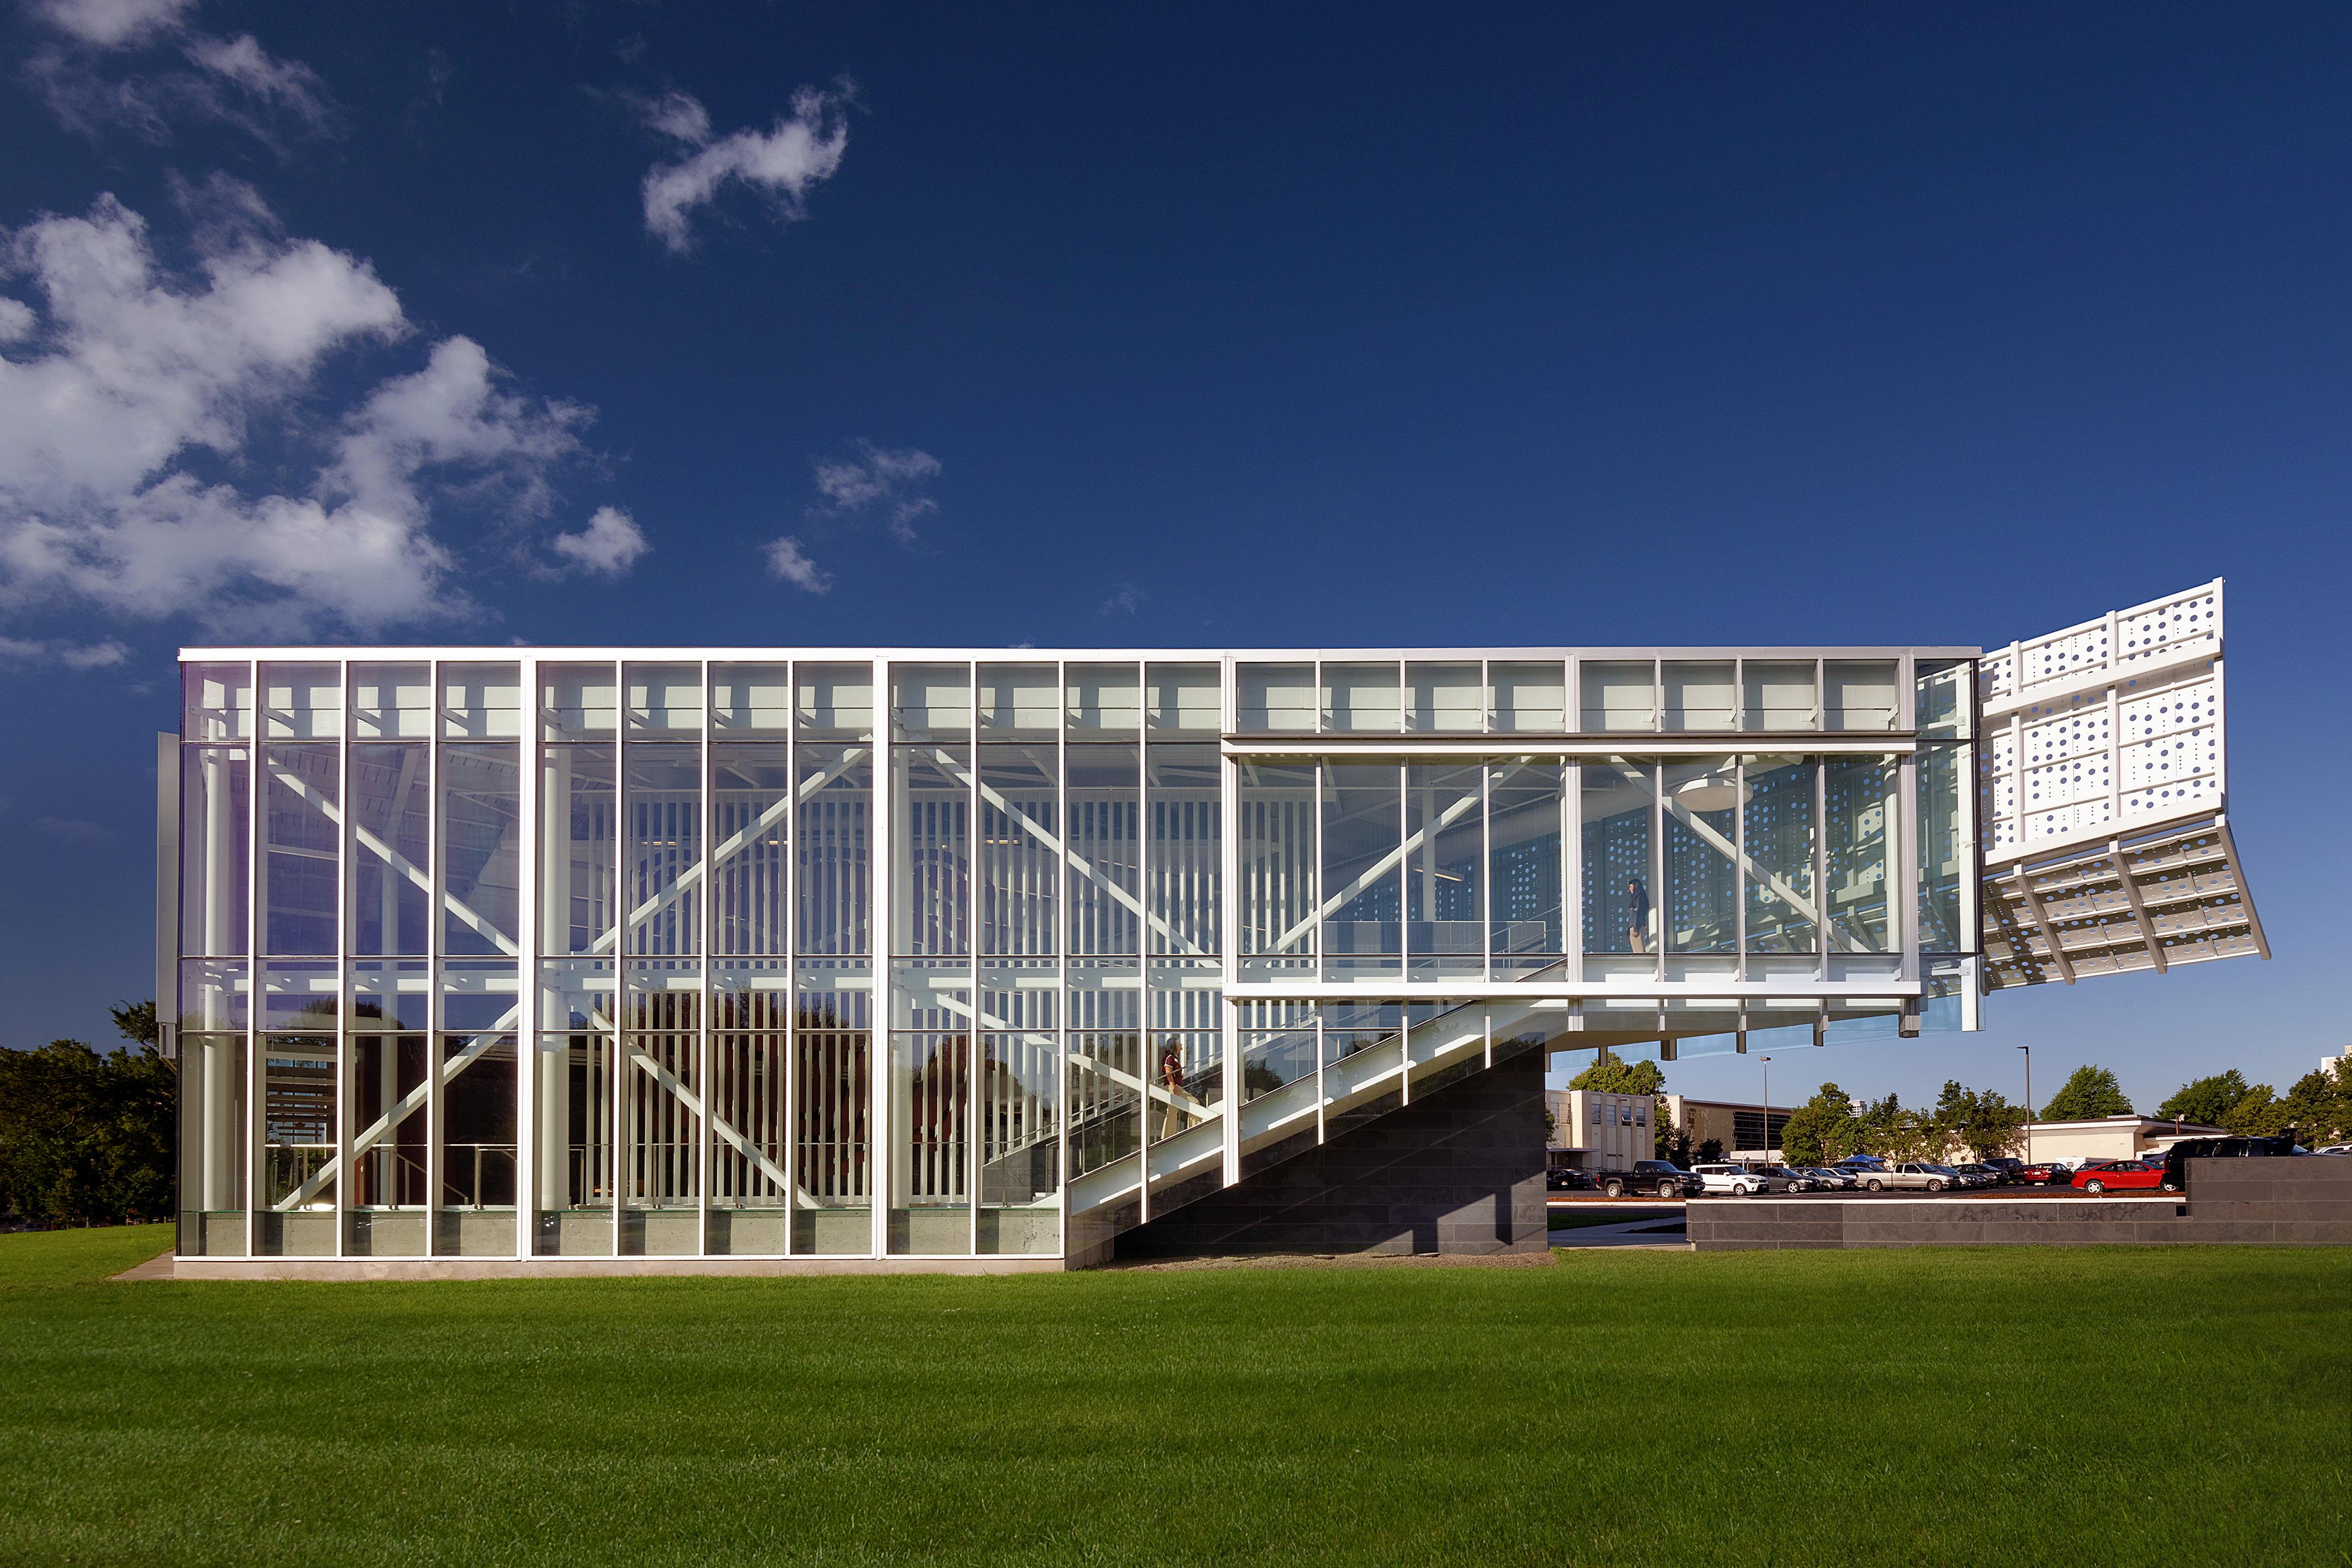 charming springfield architects #2: MSU Davis-Harrington Welcome Center   Architect Magazine   Dake Wells  Architecture, Springfield, MO, USA, Commercial, Education, Office, New  Construction, ...